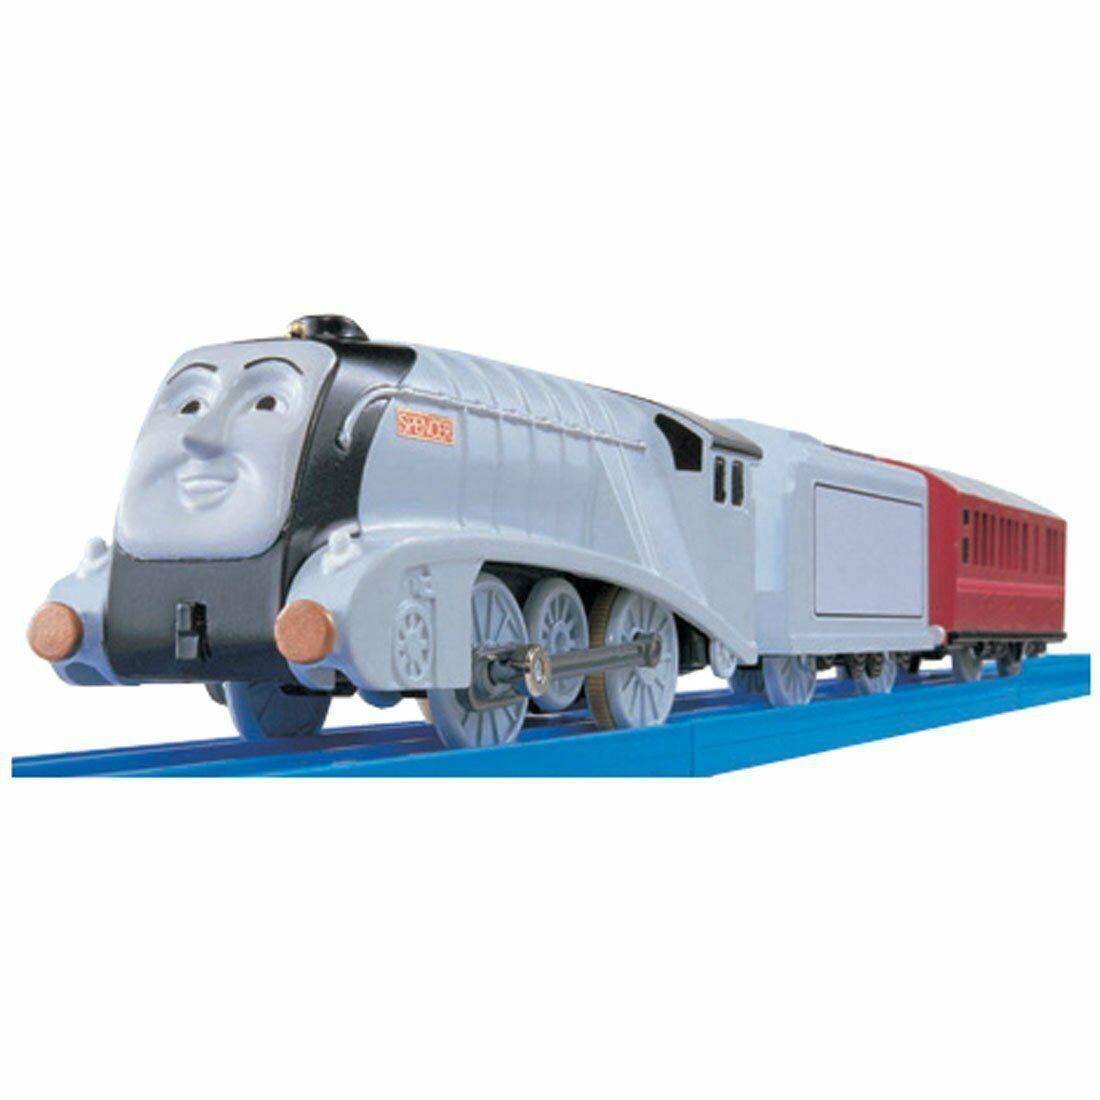 Spencer - Plarail